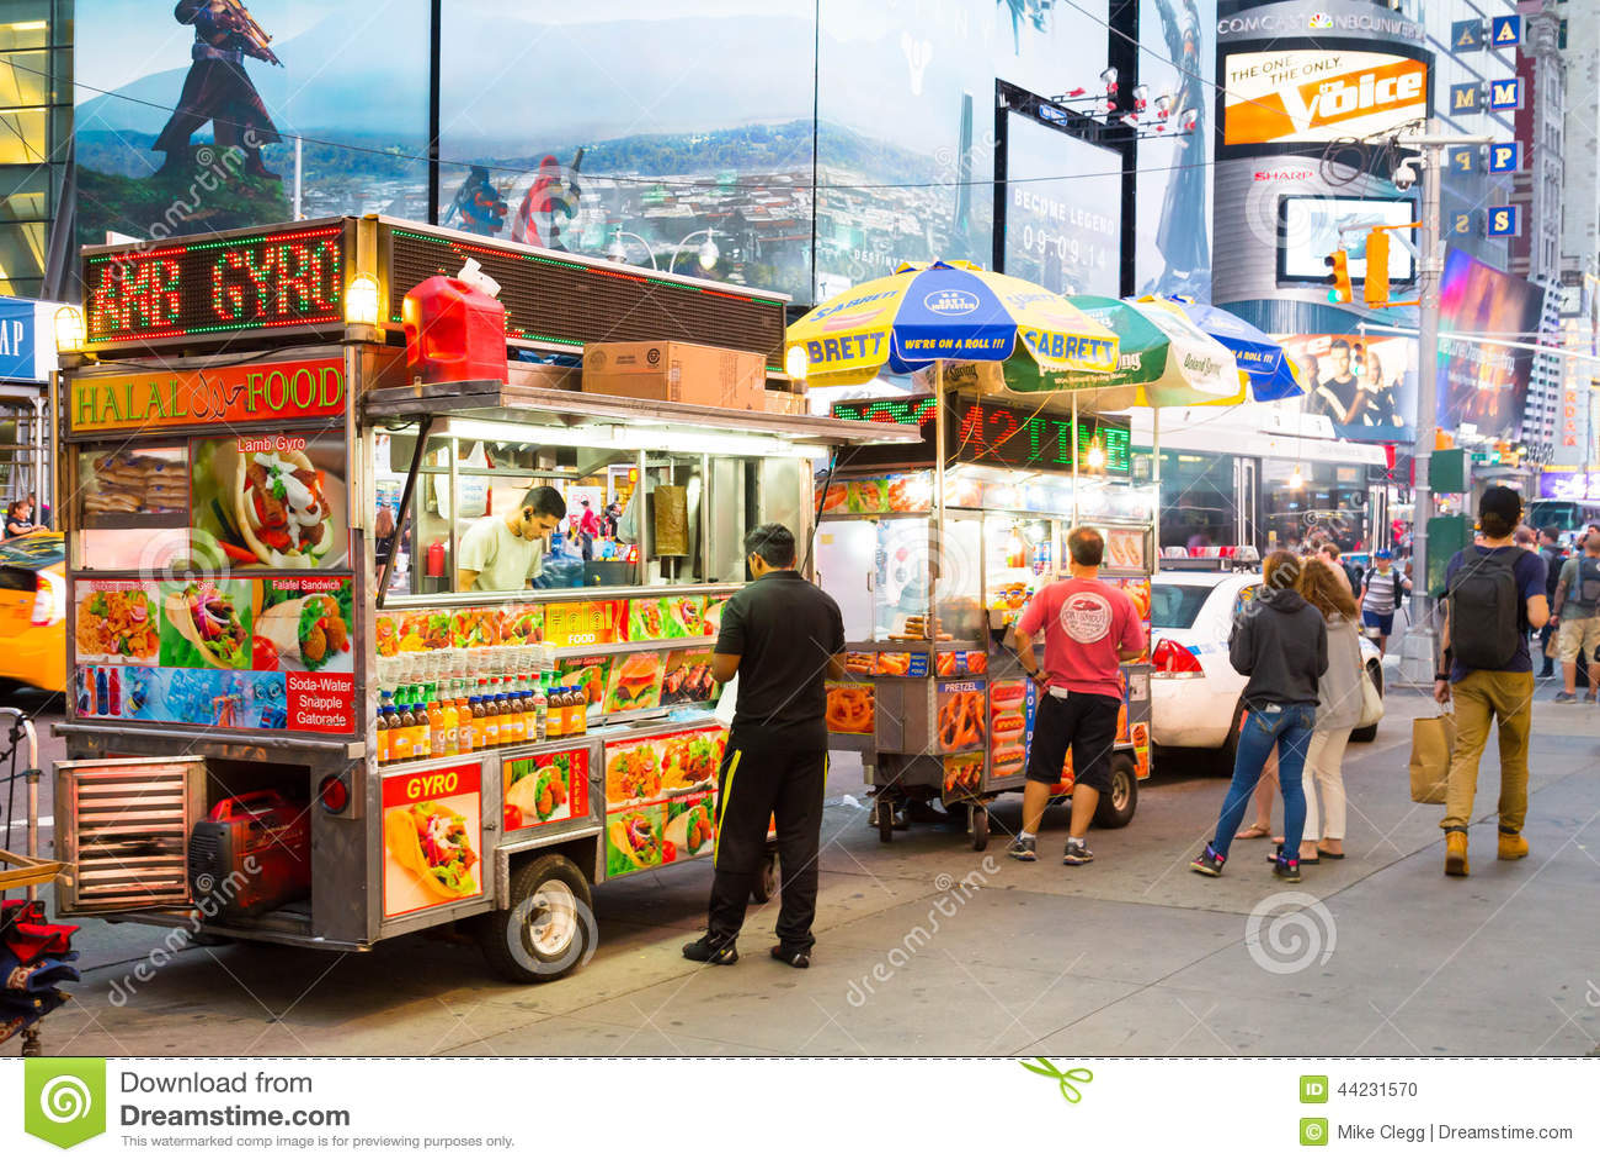 Food Trucks In Nyc